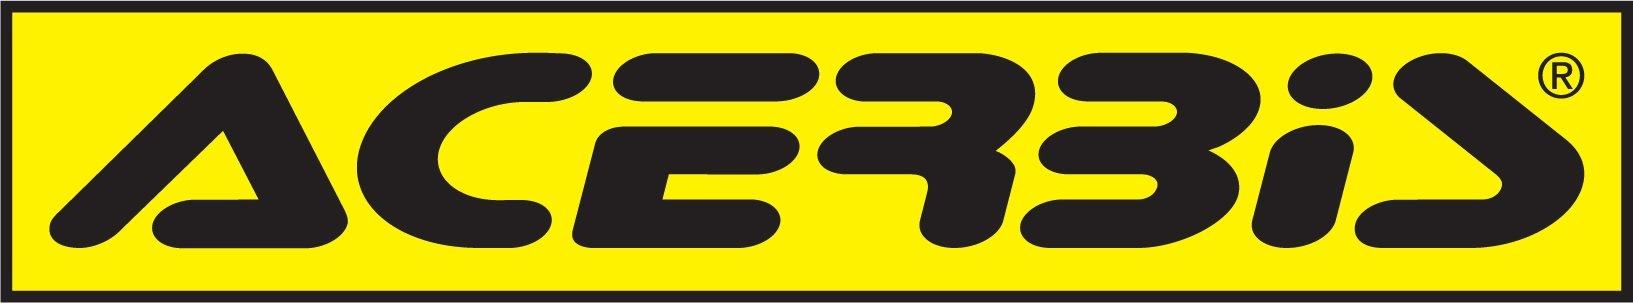 17-18 KTM 350EXCF: Acerbis Skid Plate (BLACK)